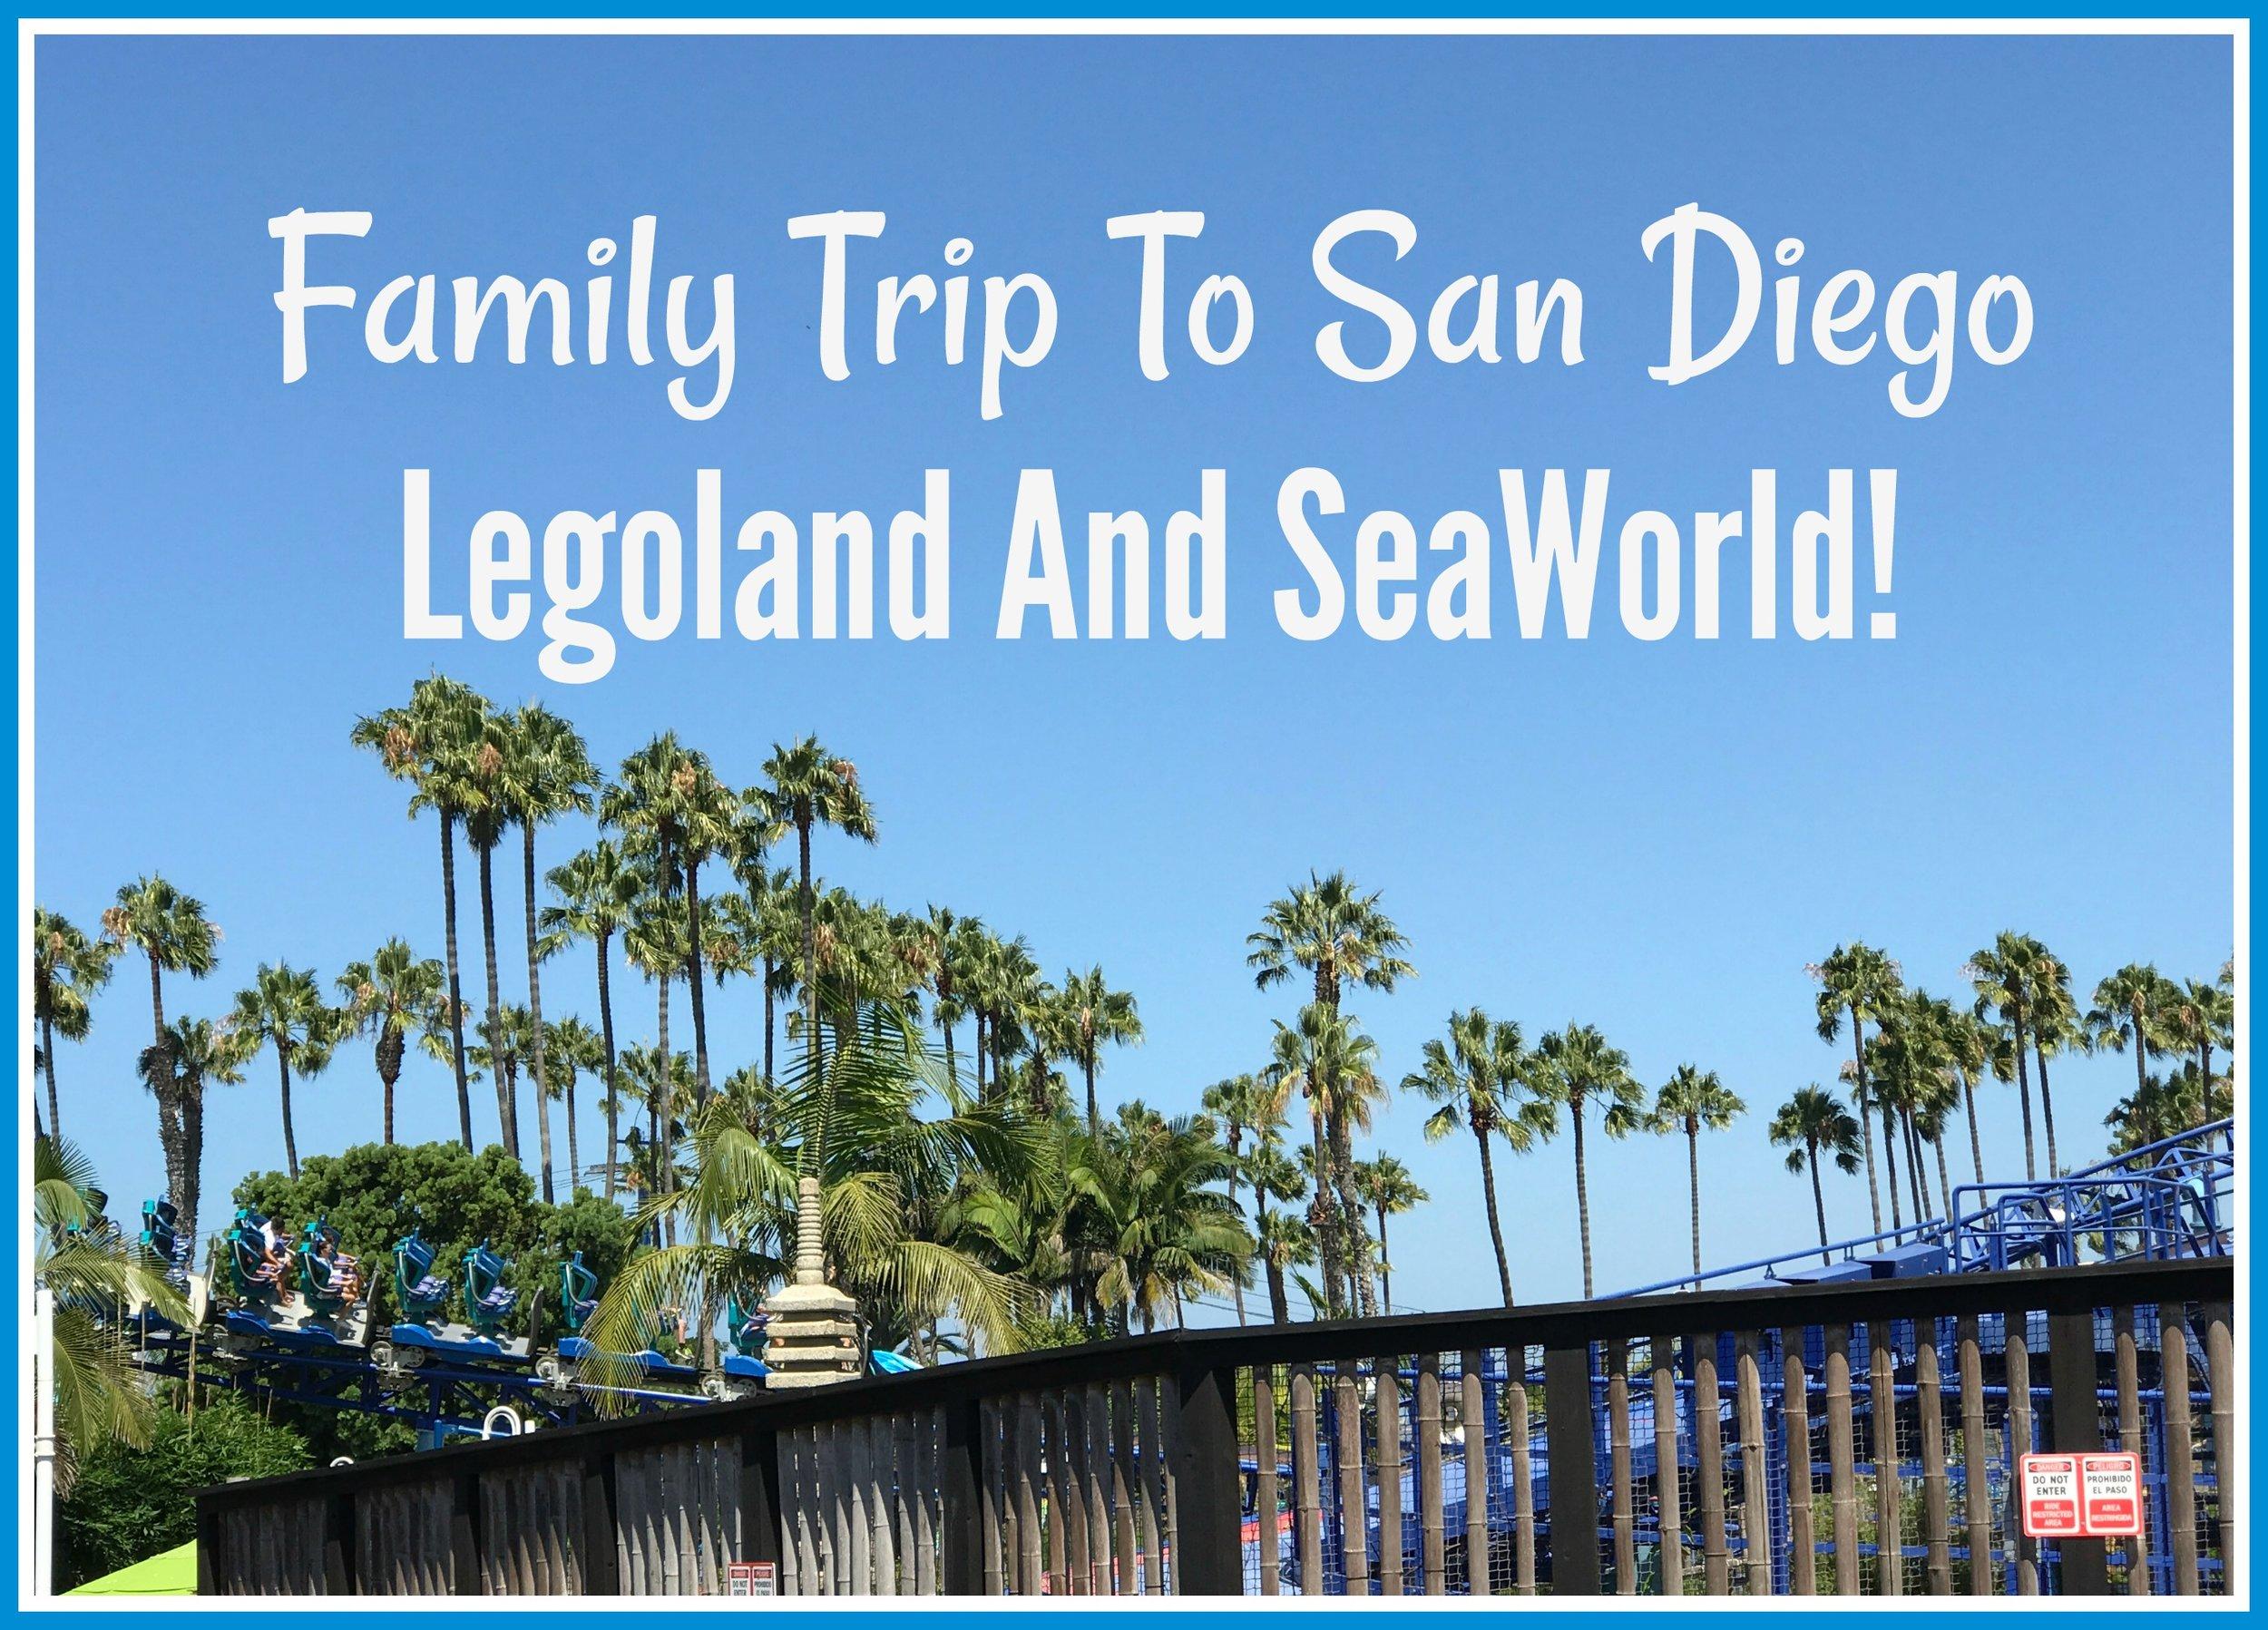 Family Trip To San Diego, Legoland and SeaWorld.jpg